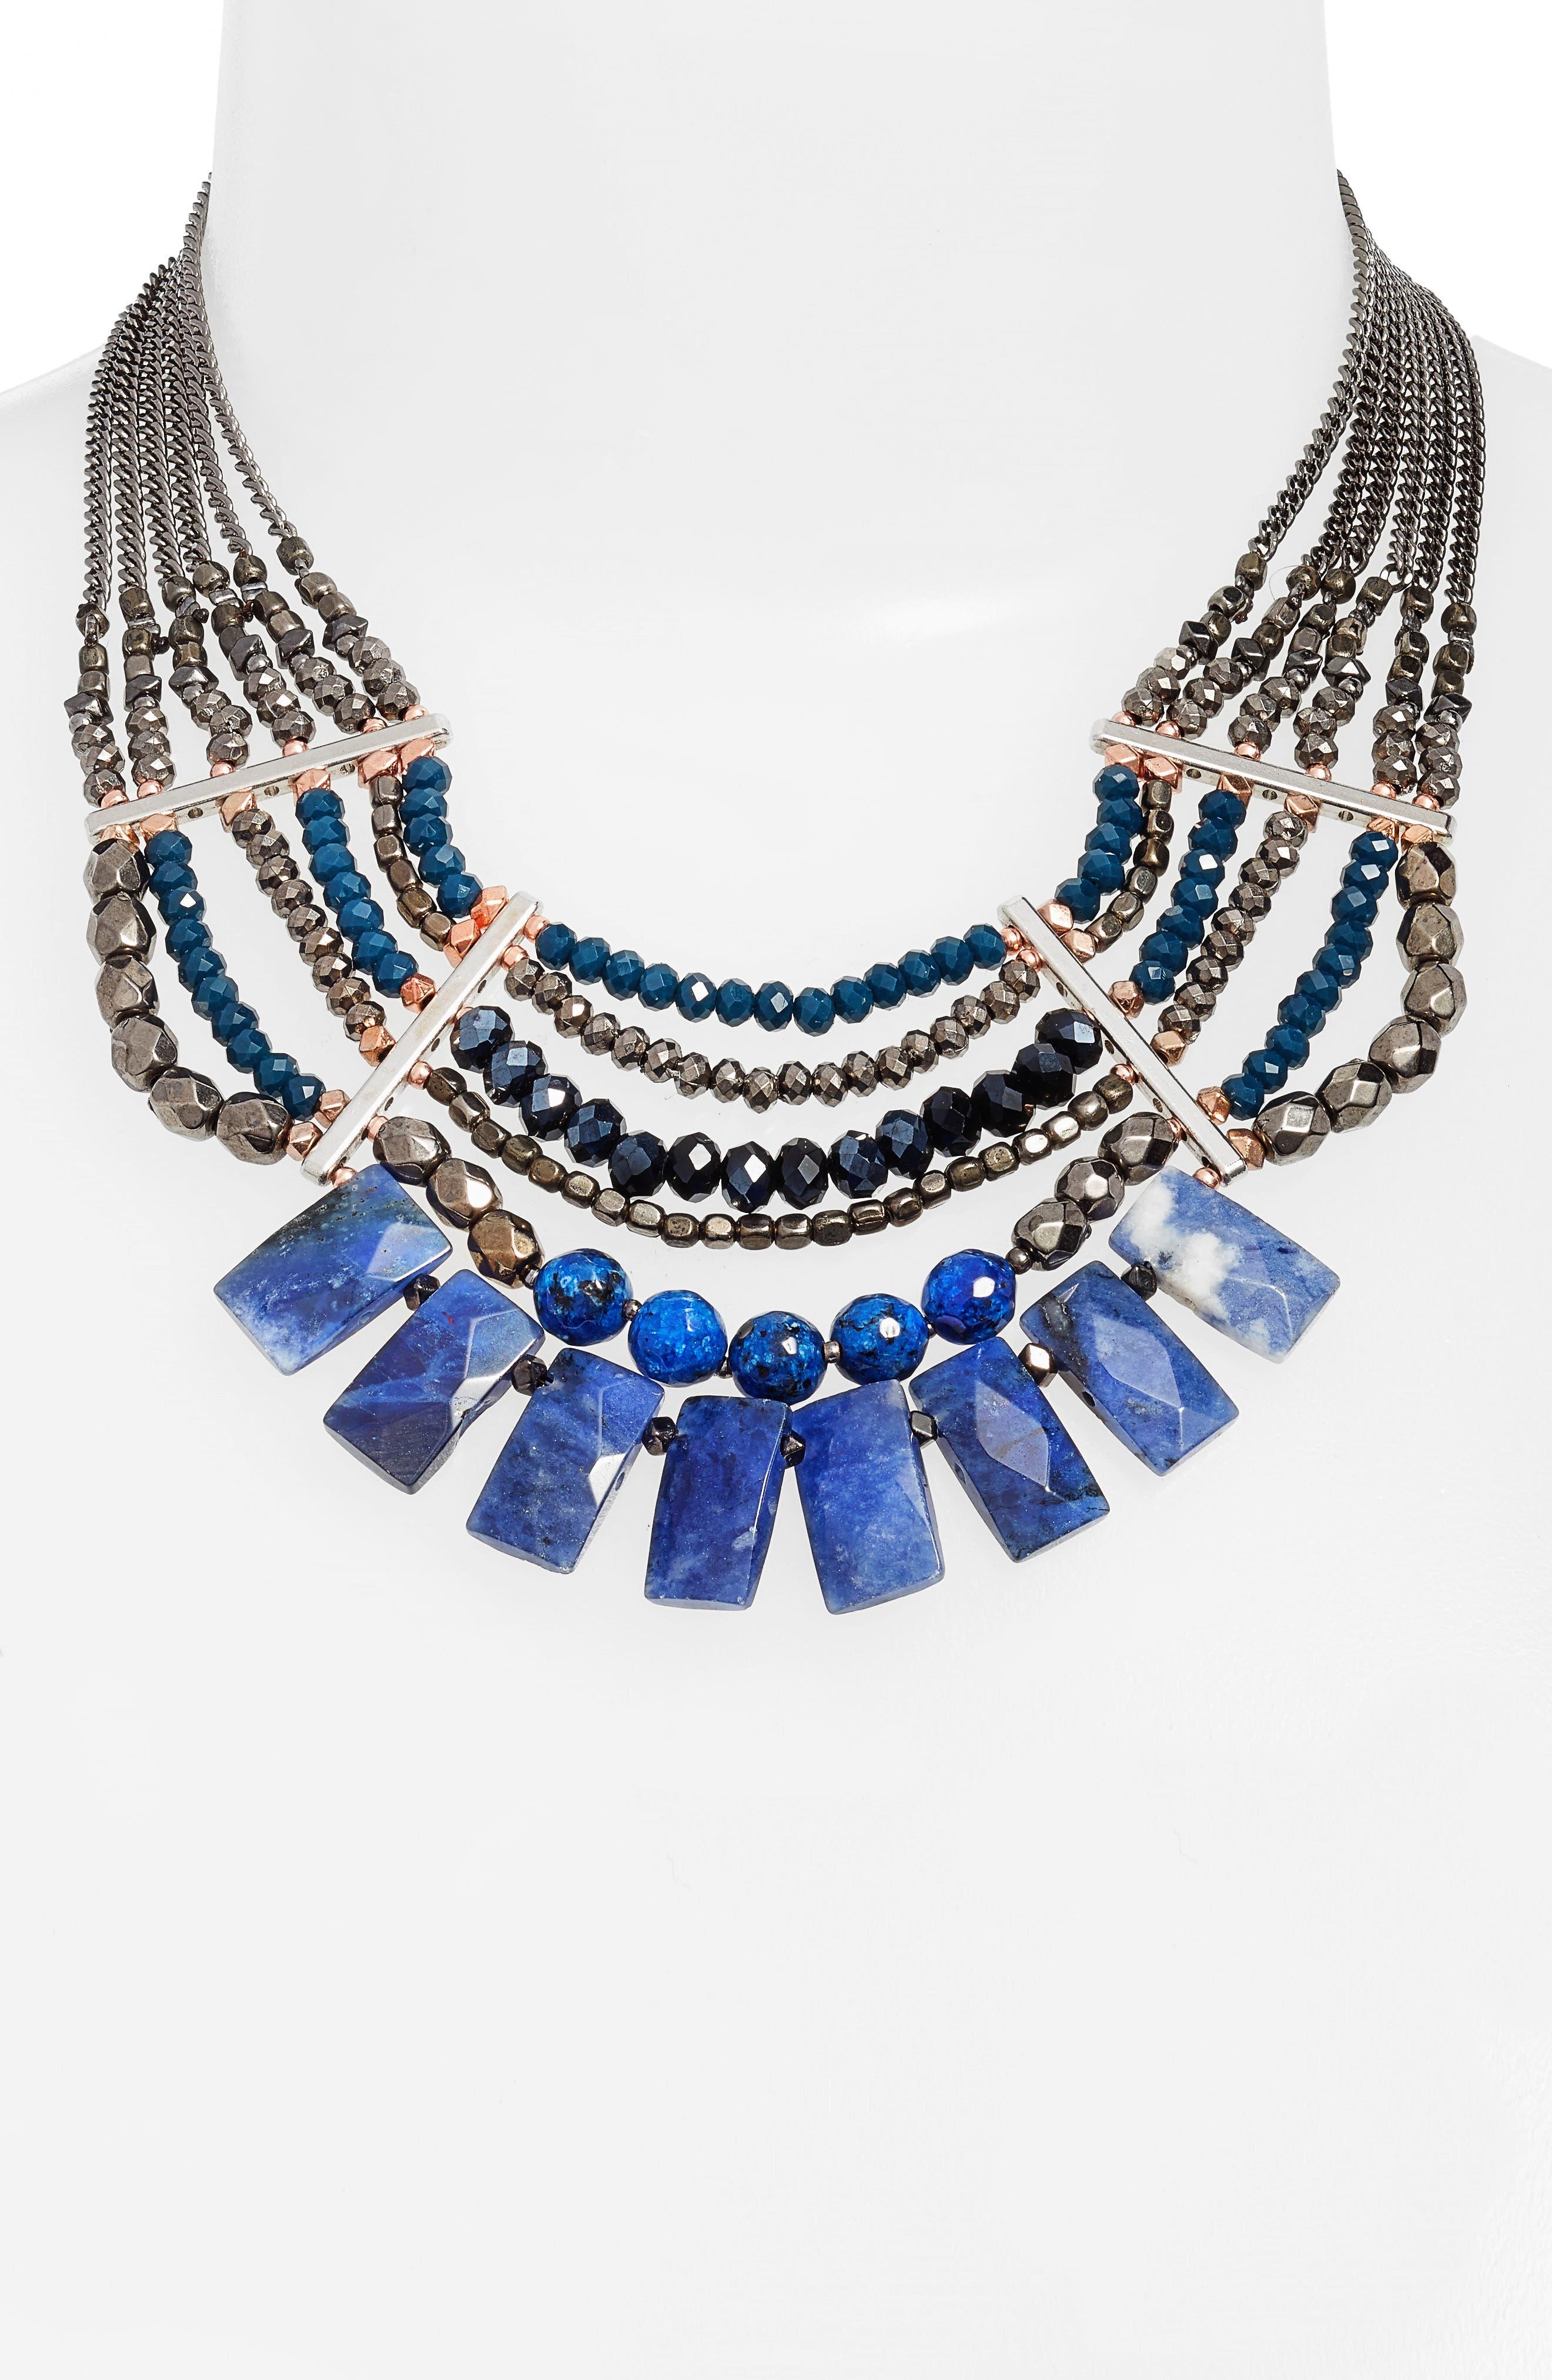 Nakamol Design Semiprecious Stone Beaded Fringe Collar Necklace